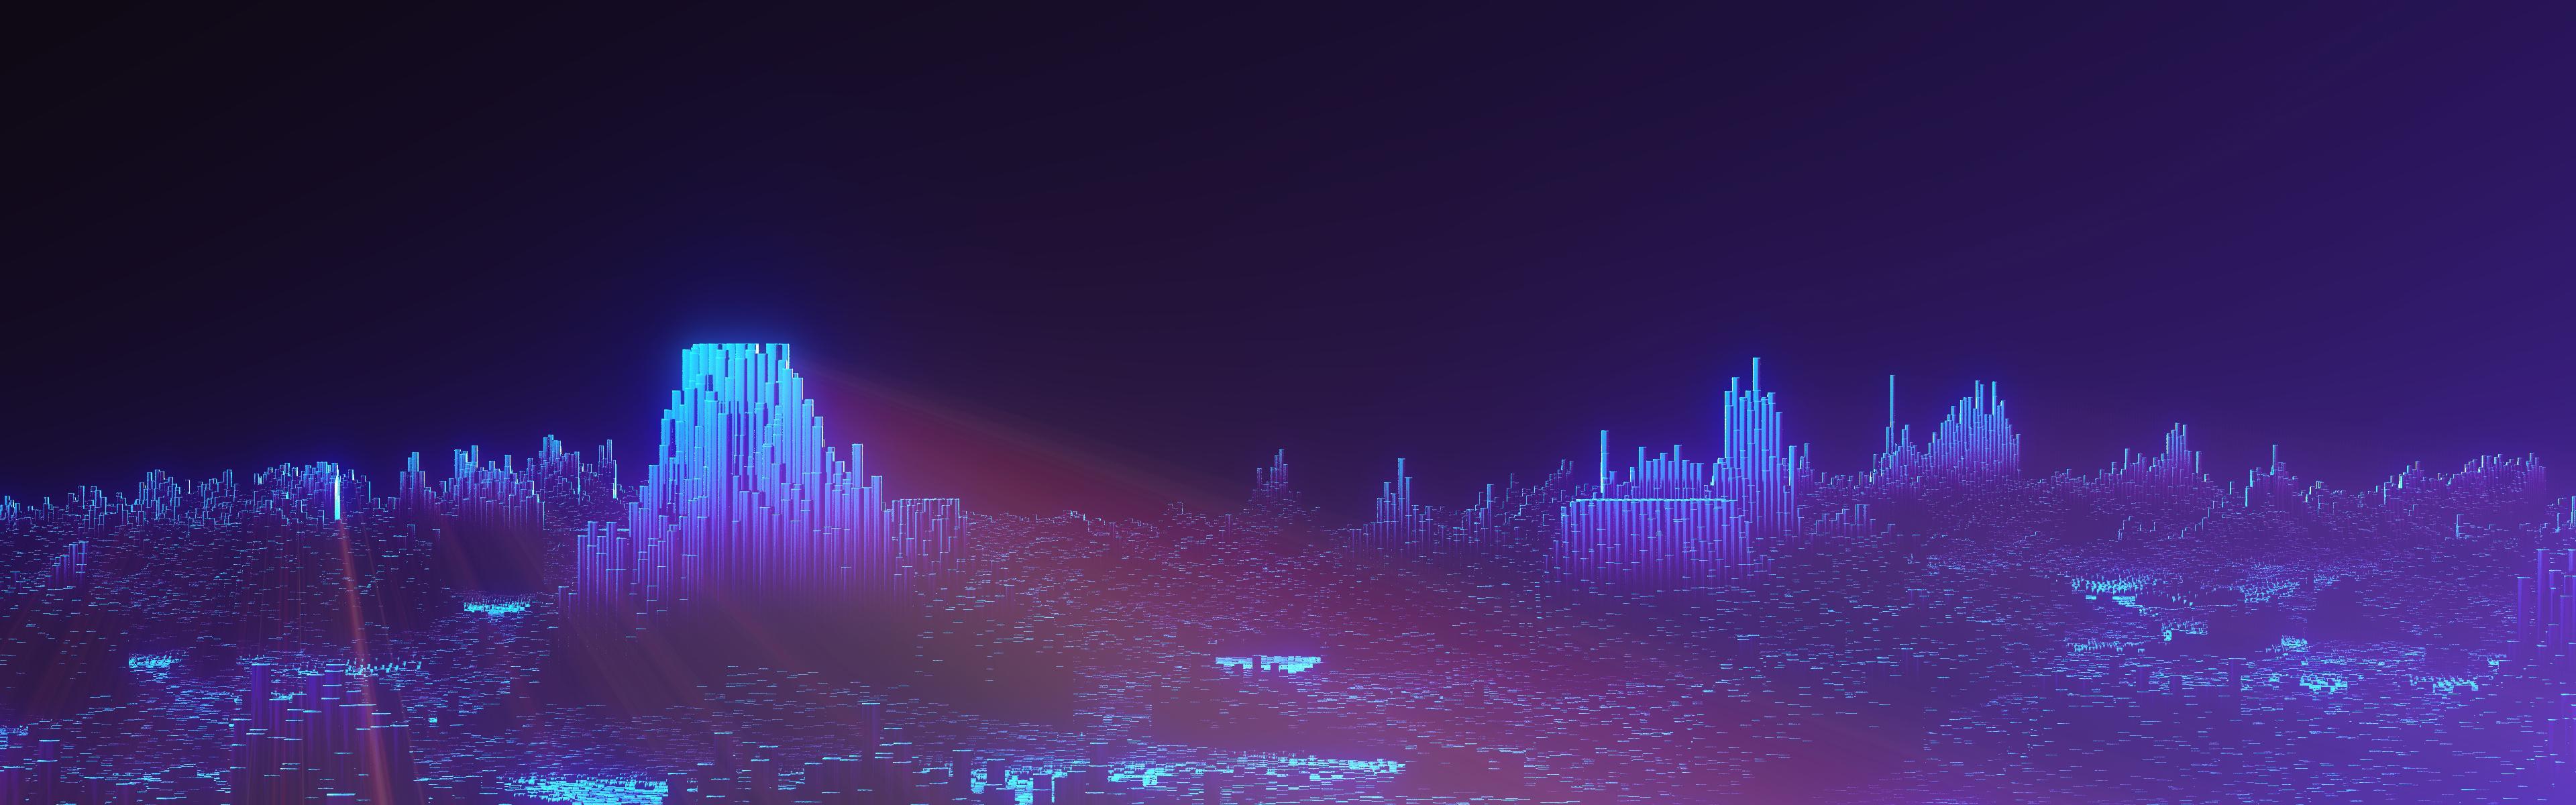 neon lights * wallpaper